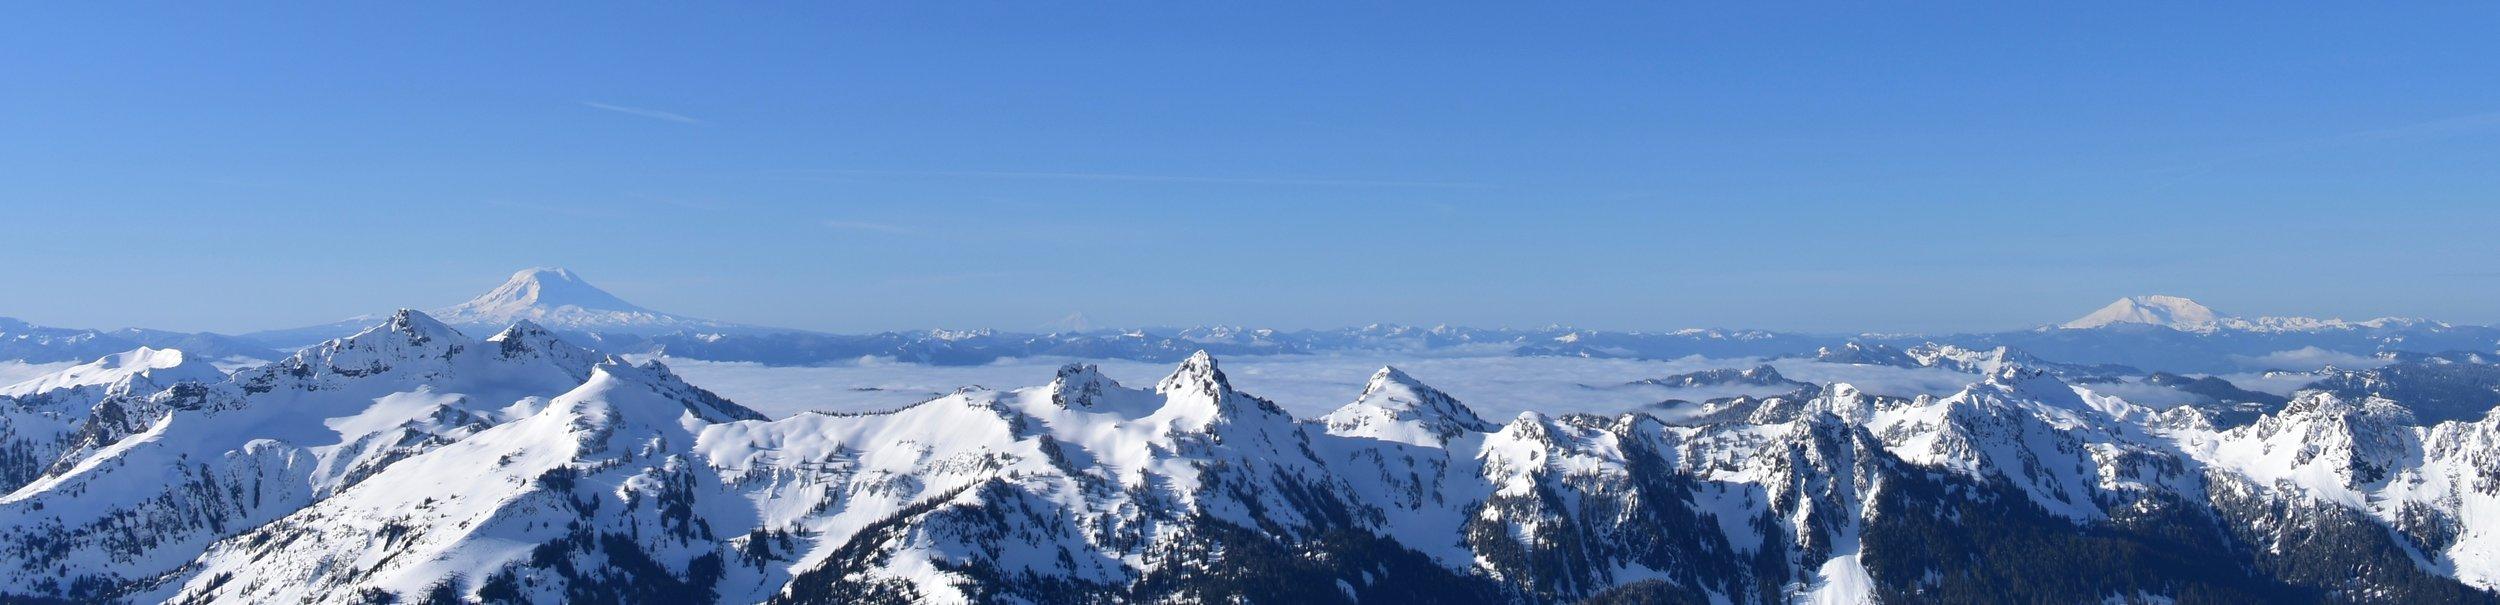 Left to Right: Mt. Adams, Mt. Hood, Mt. Saint Helens